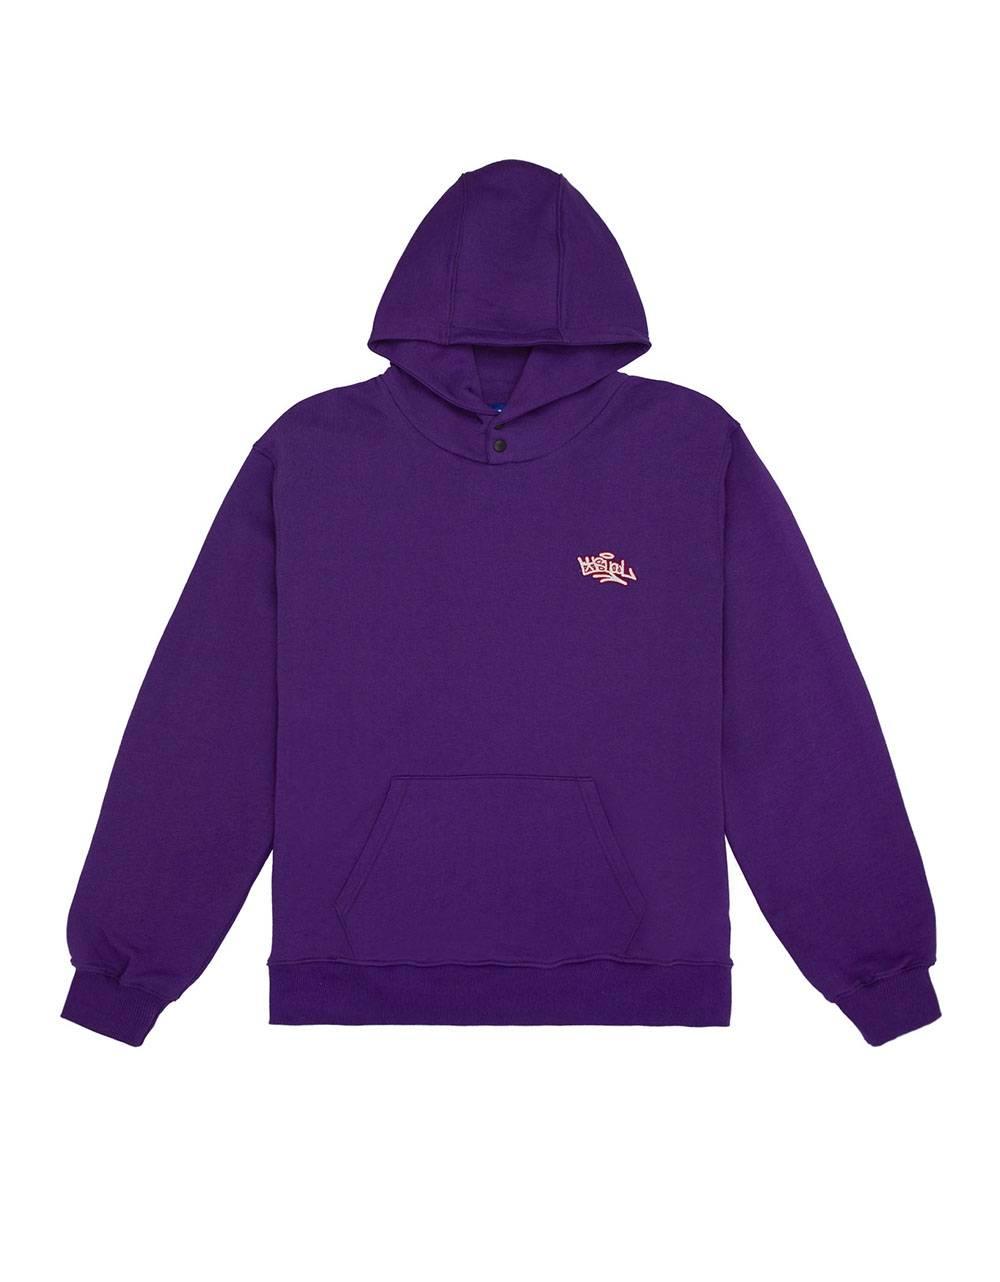 Usual Tag Hooded Sweatshirt - purple Usual Sweater 120,00€